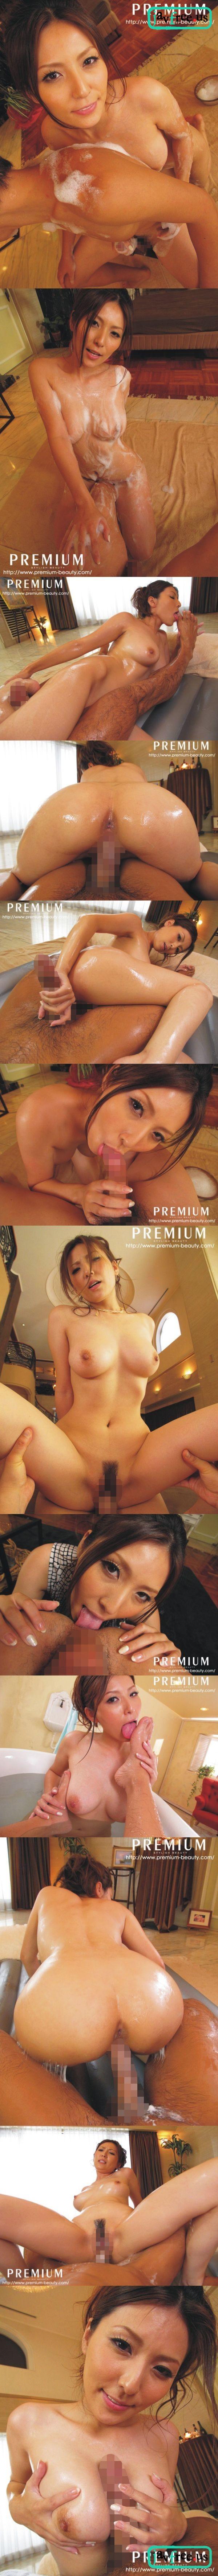 [PGD 461] PREMIUM STYLISH SOAP 椎名ゆな 椎名ゆな PREMIUM STYLISH SOAP PGD